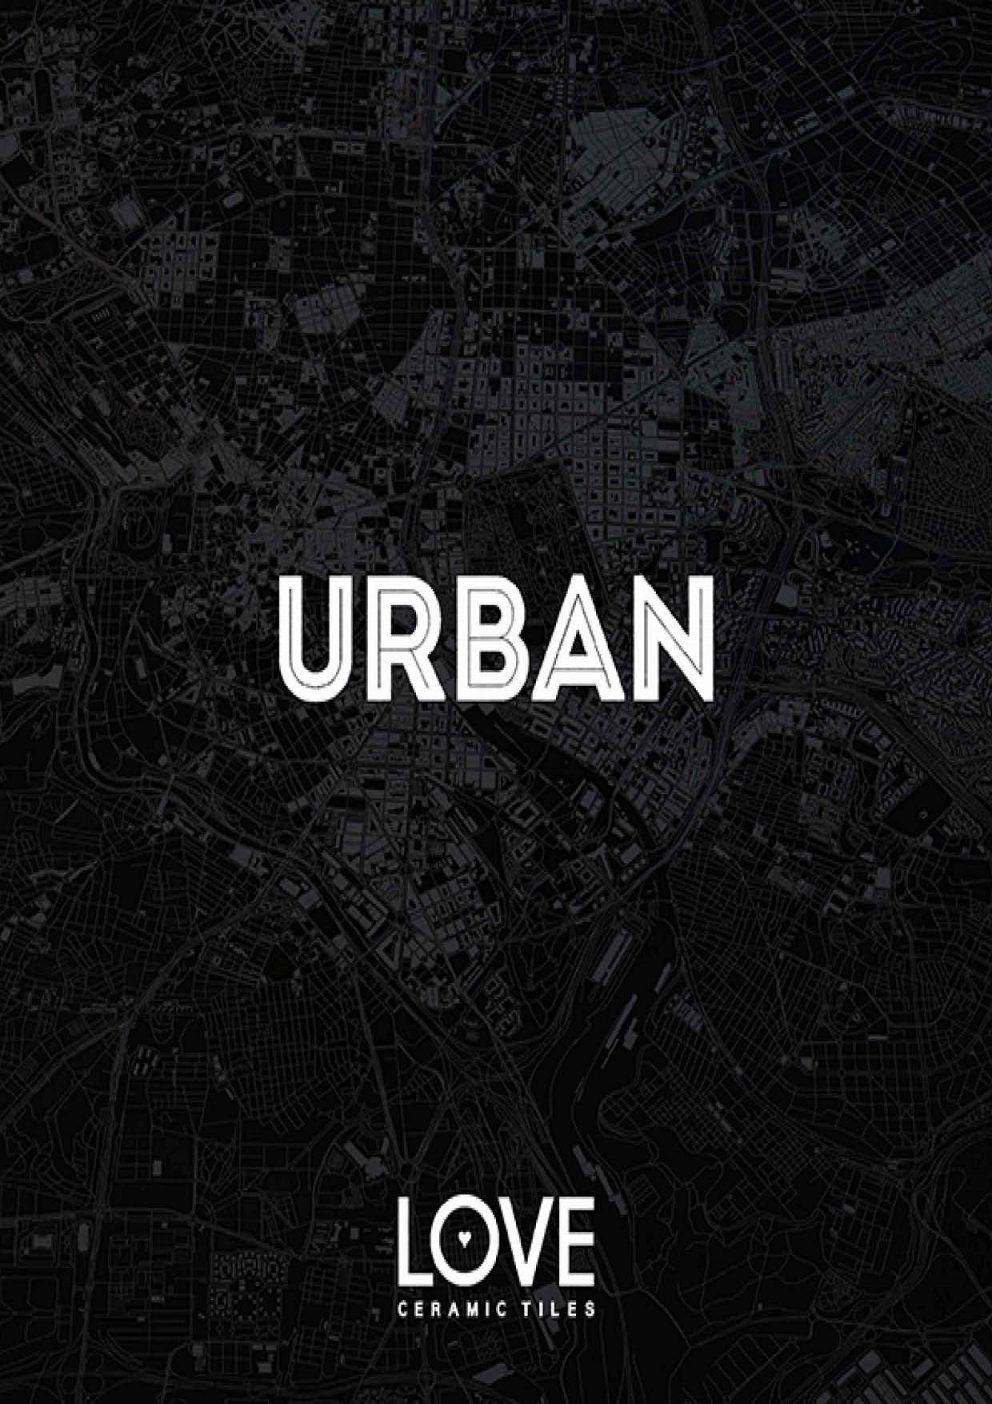 Love - Urban